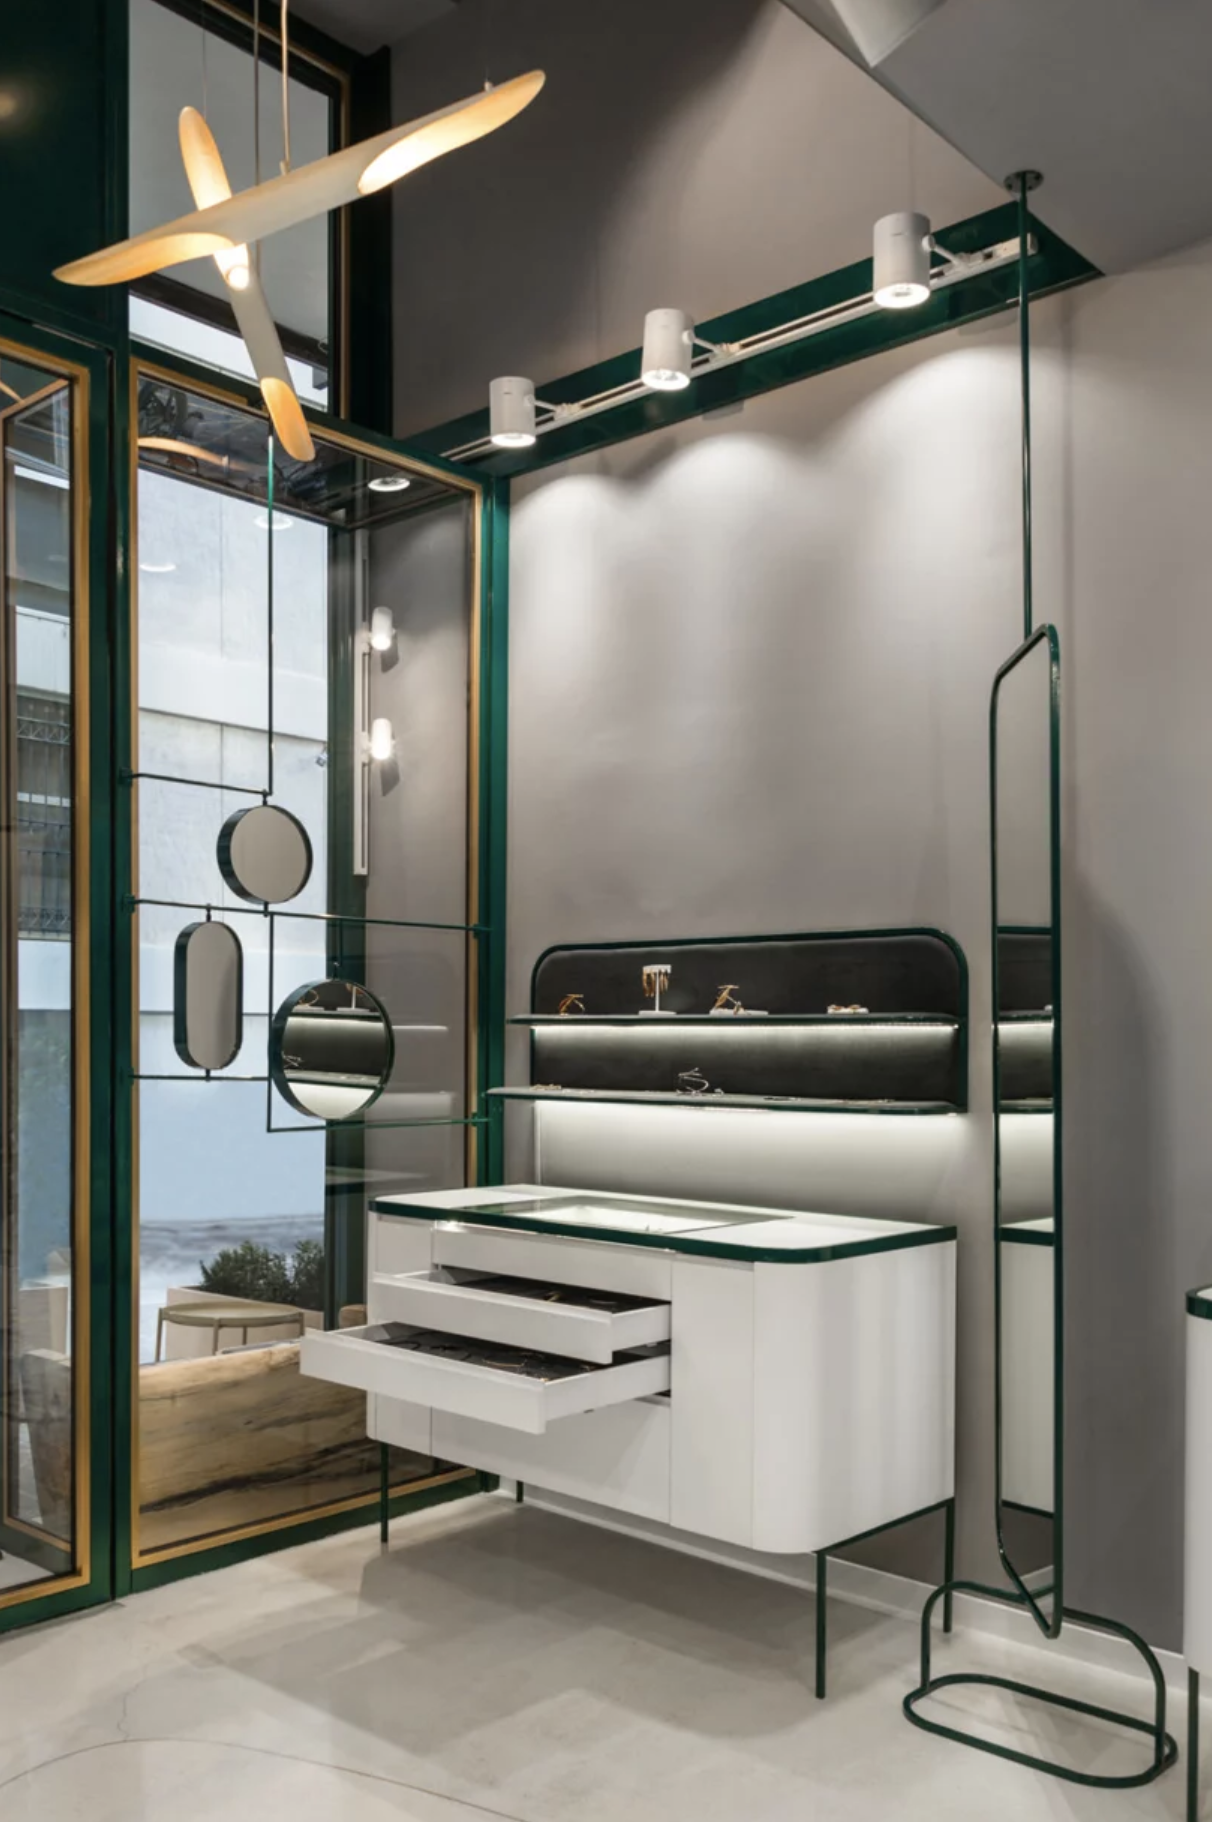 viventium-design-zac-kraemer-urban-soul-jewelry-retail-design-9.png